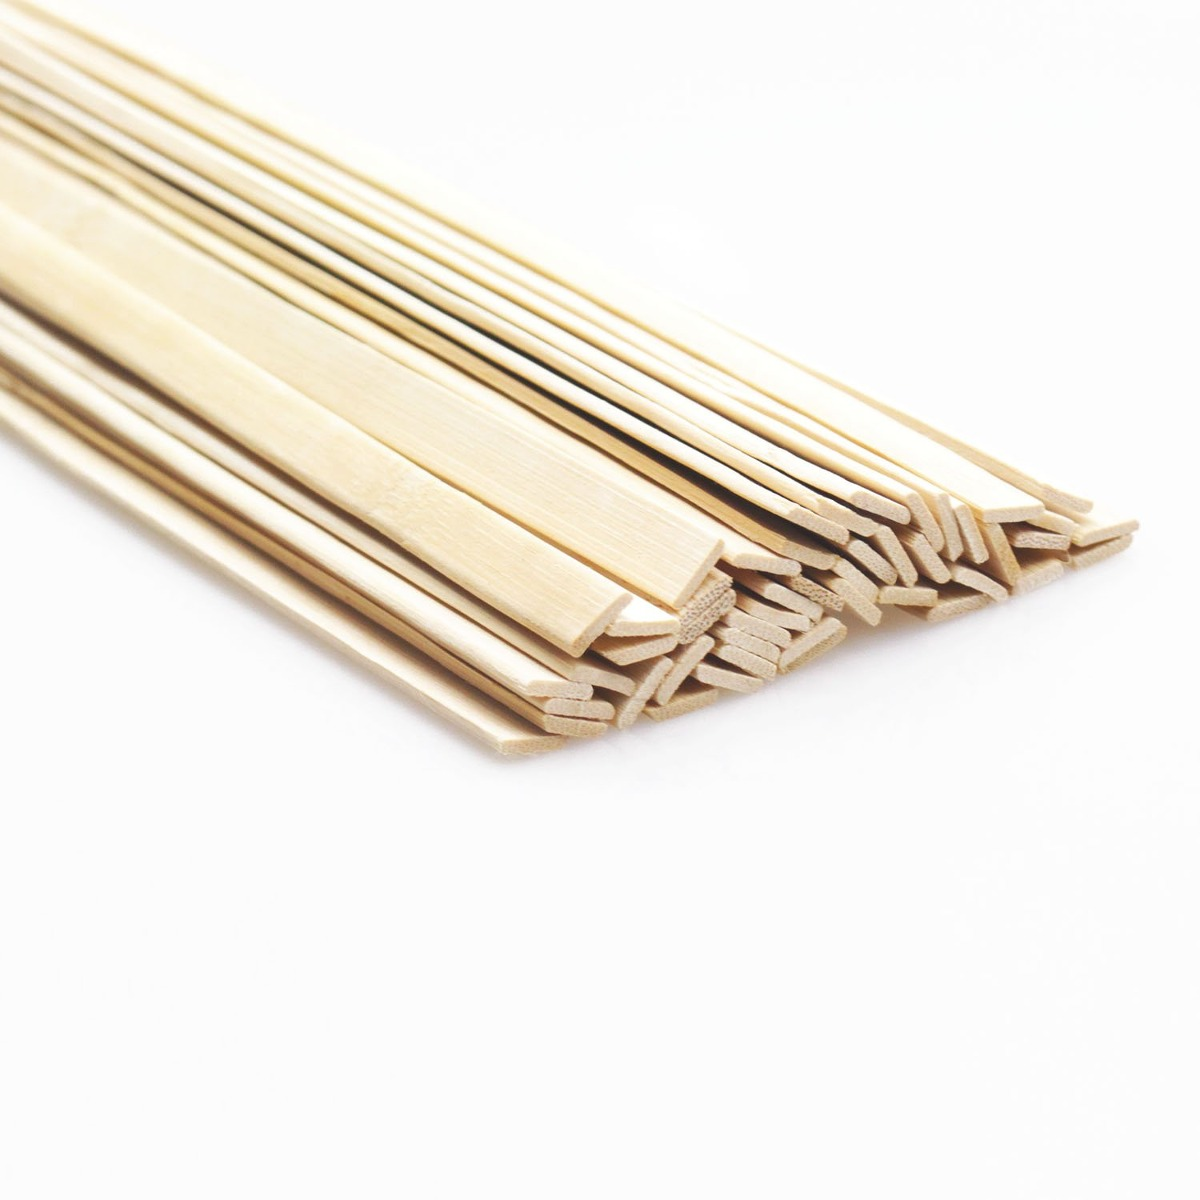 Dywishkey Palos De Bambu Natural Palitos De Madera 15 5 - Palos-de-bambu